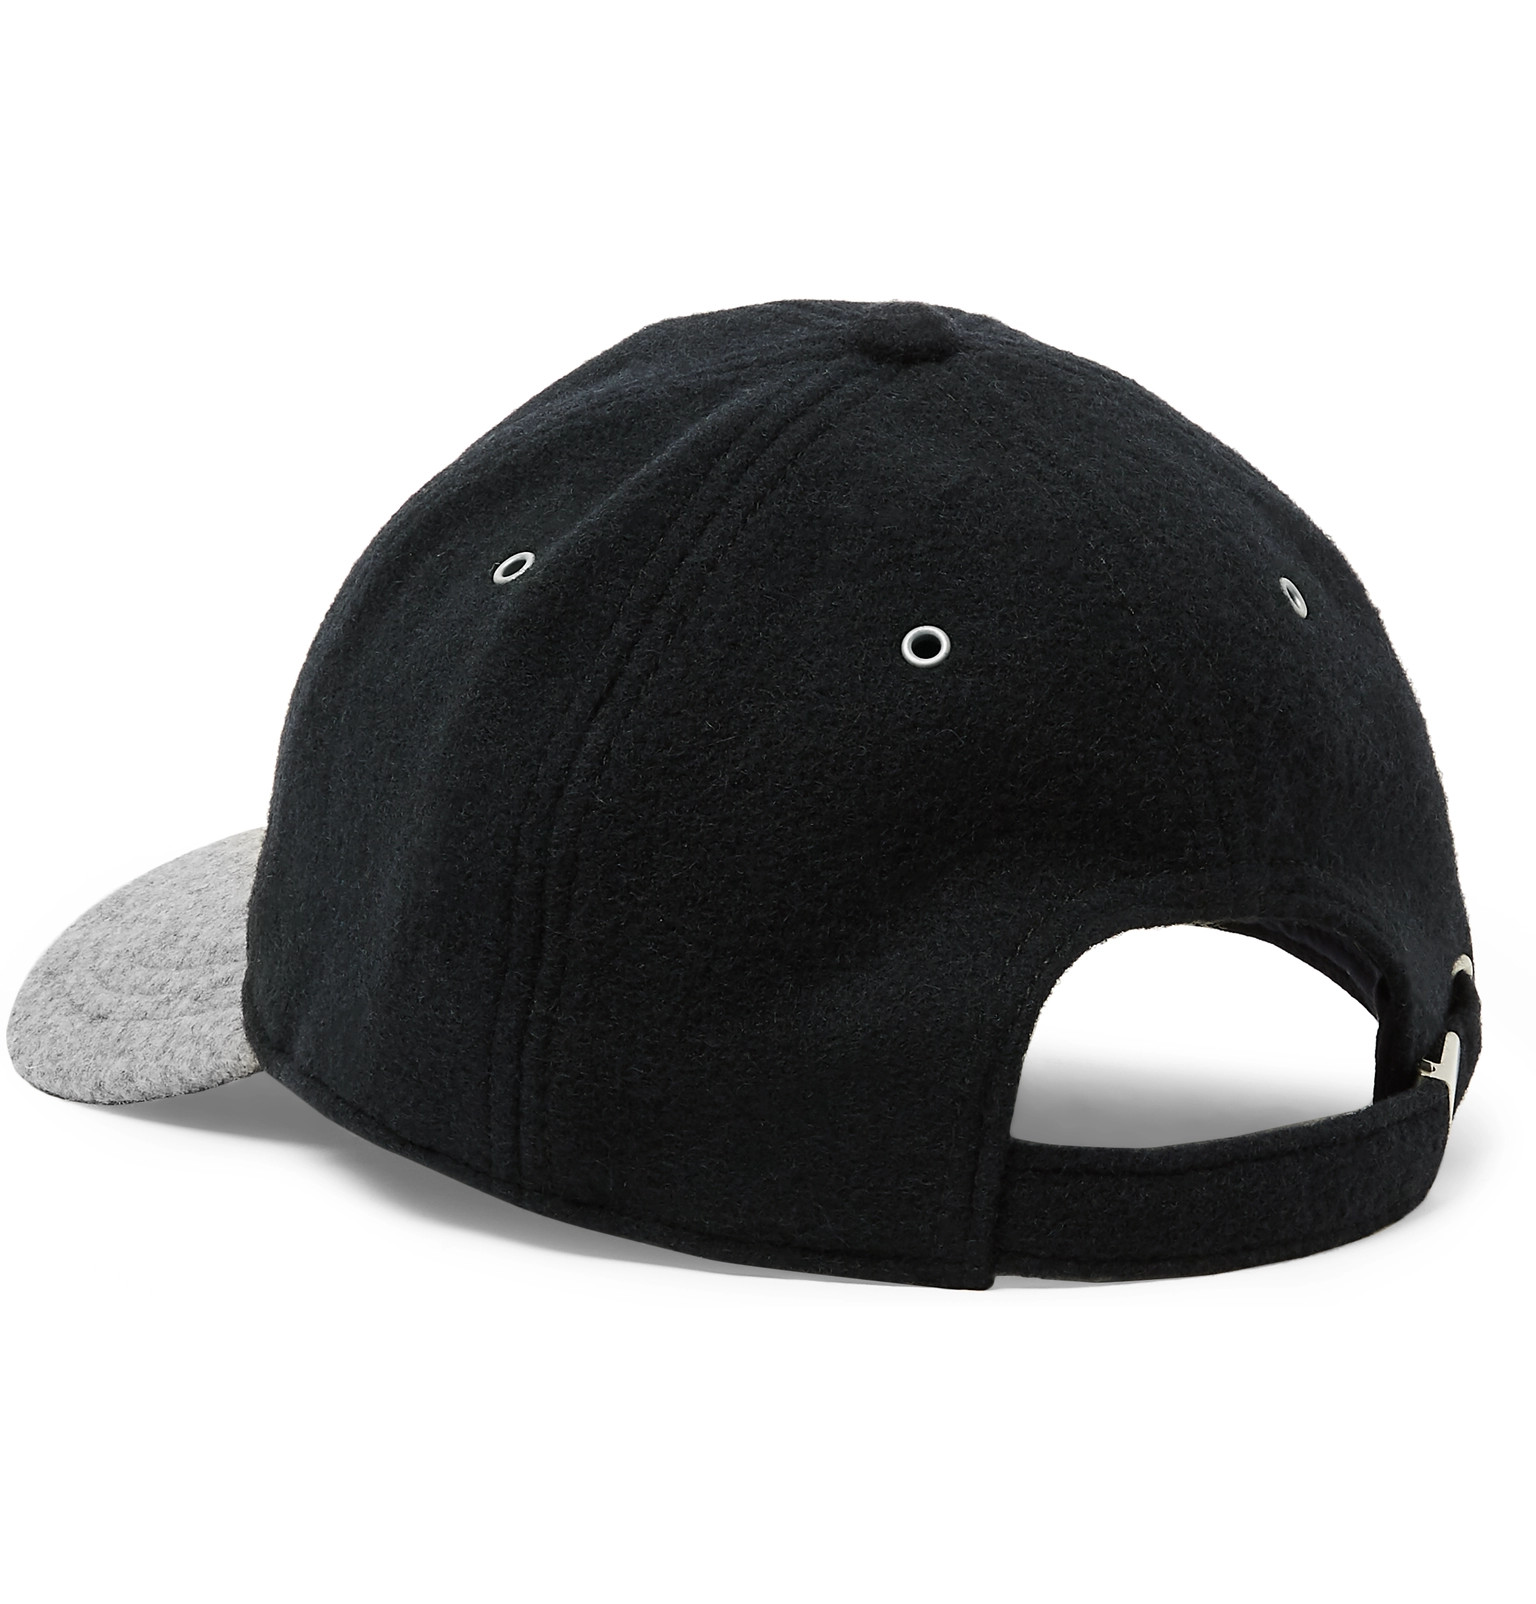 cff849b45e942 J.Crew - Two-Tone Melton Wool-Blend Baseball Cap